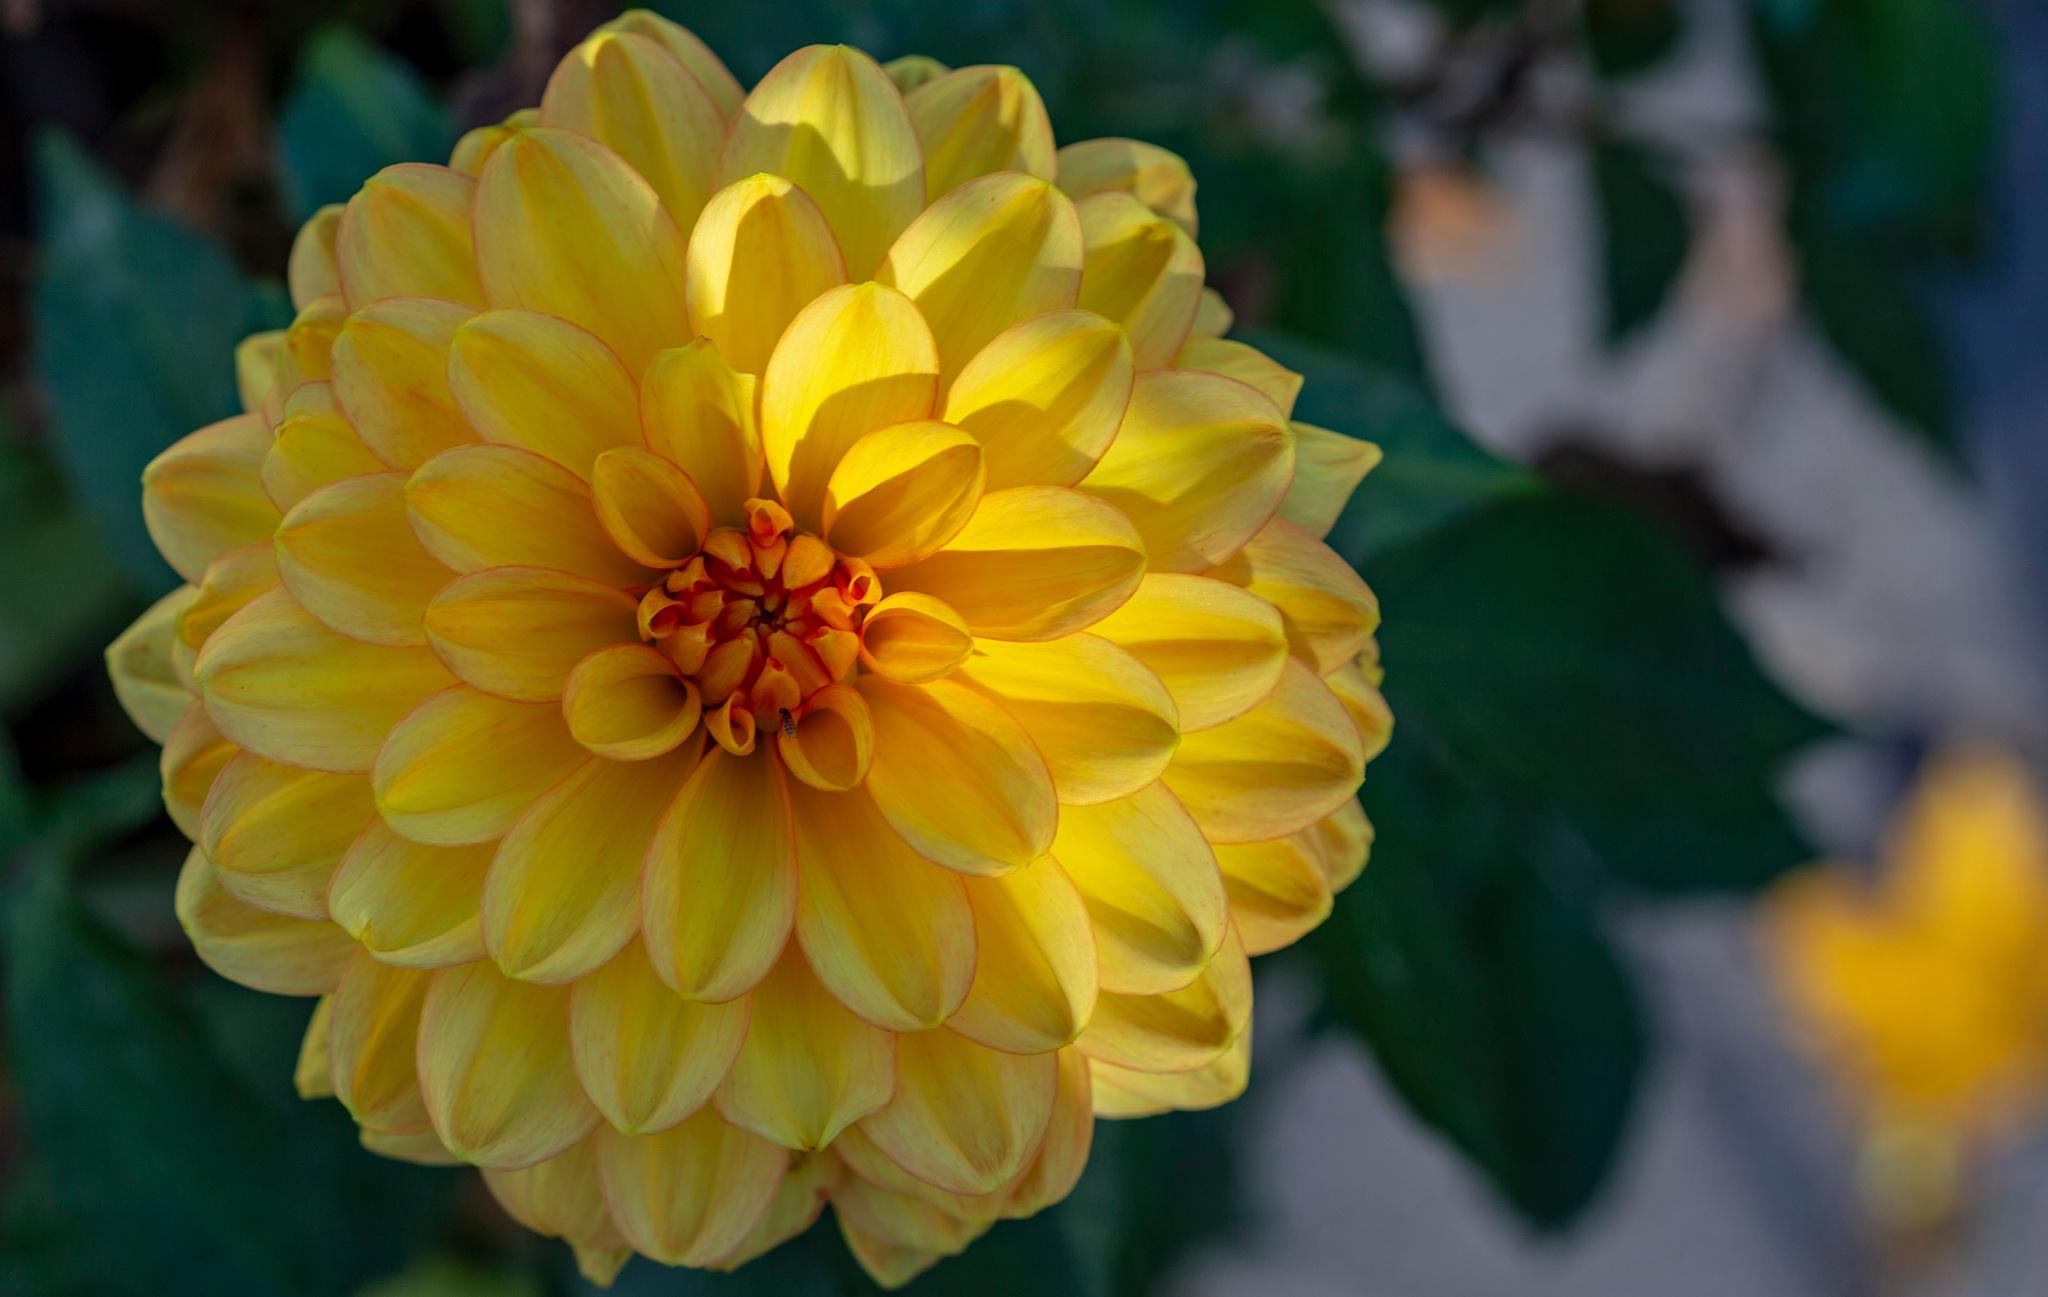 Still Blooming by carljan w carlsson